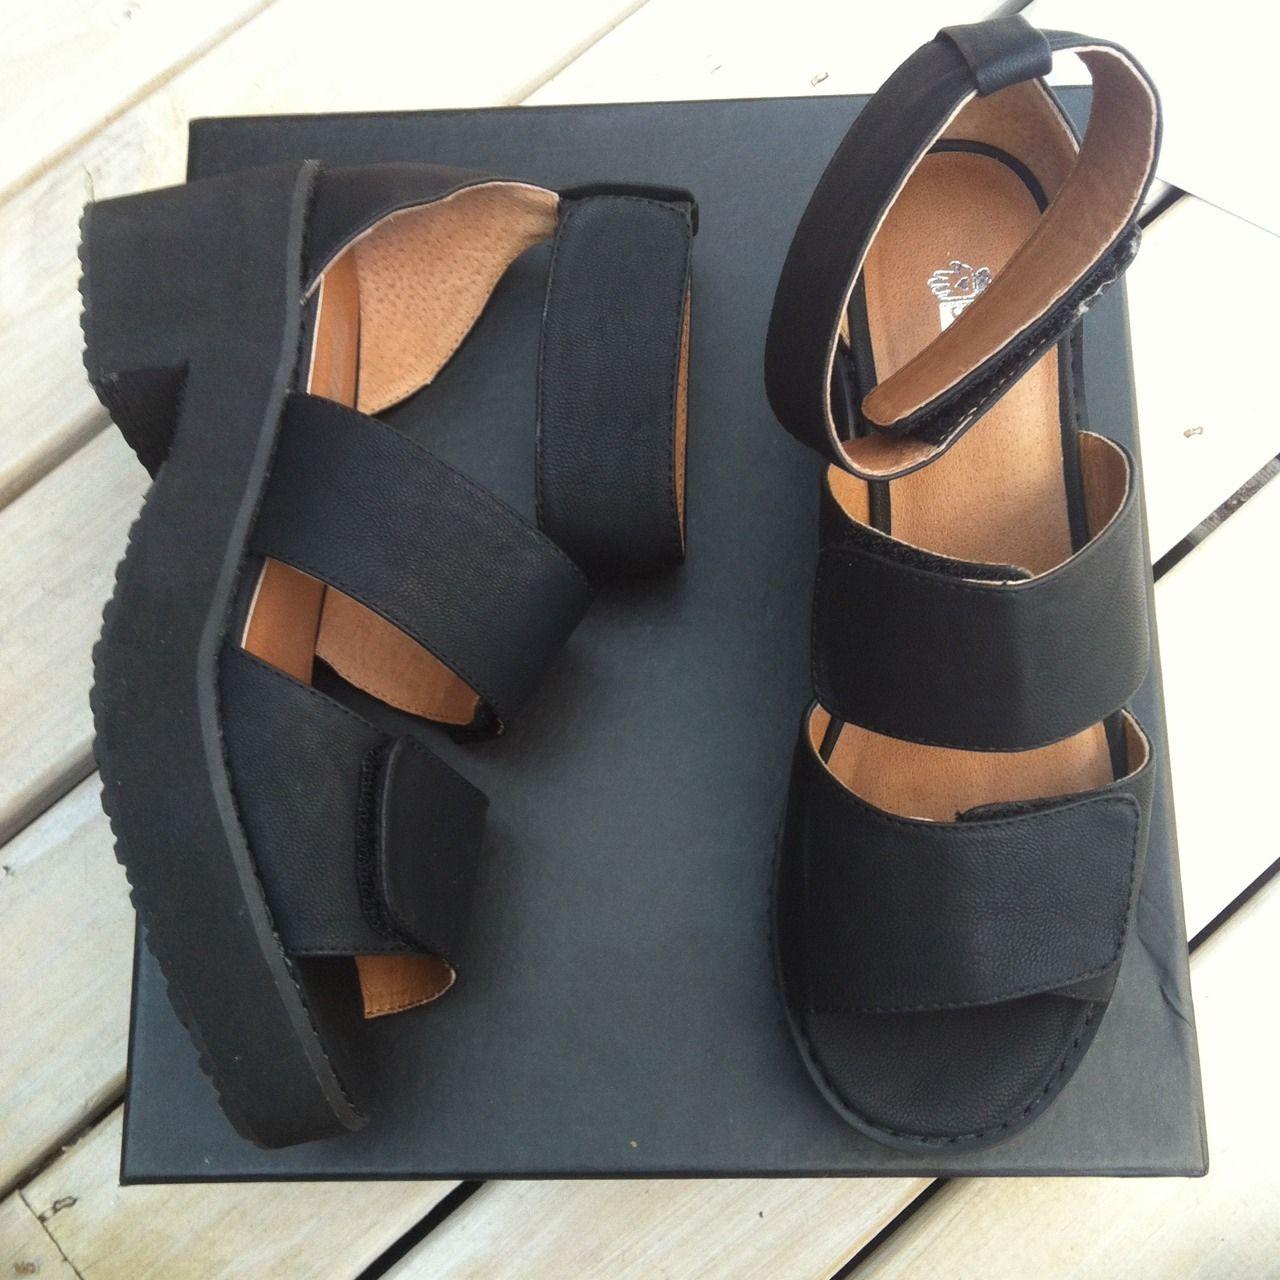 Black sandals grunge - Velcro Too I Need These Chunky Sandalsblack